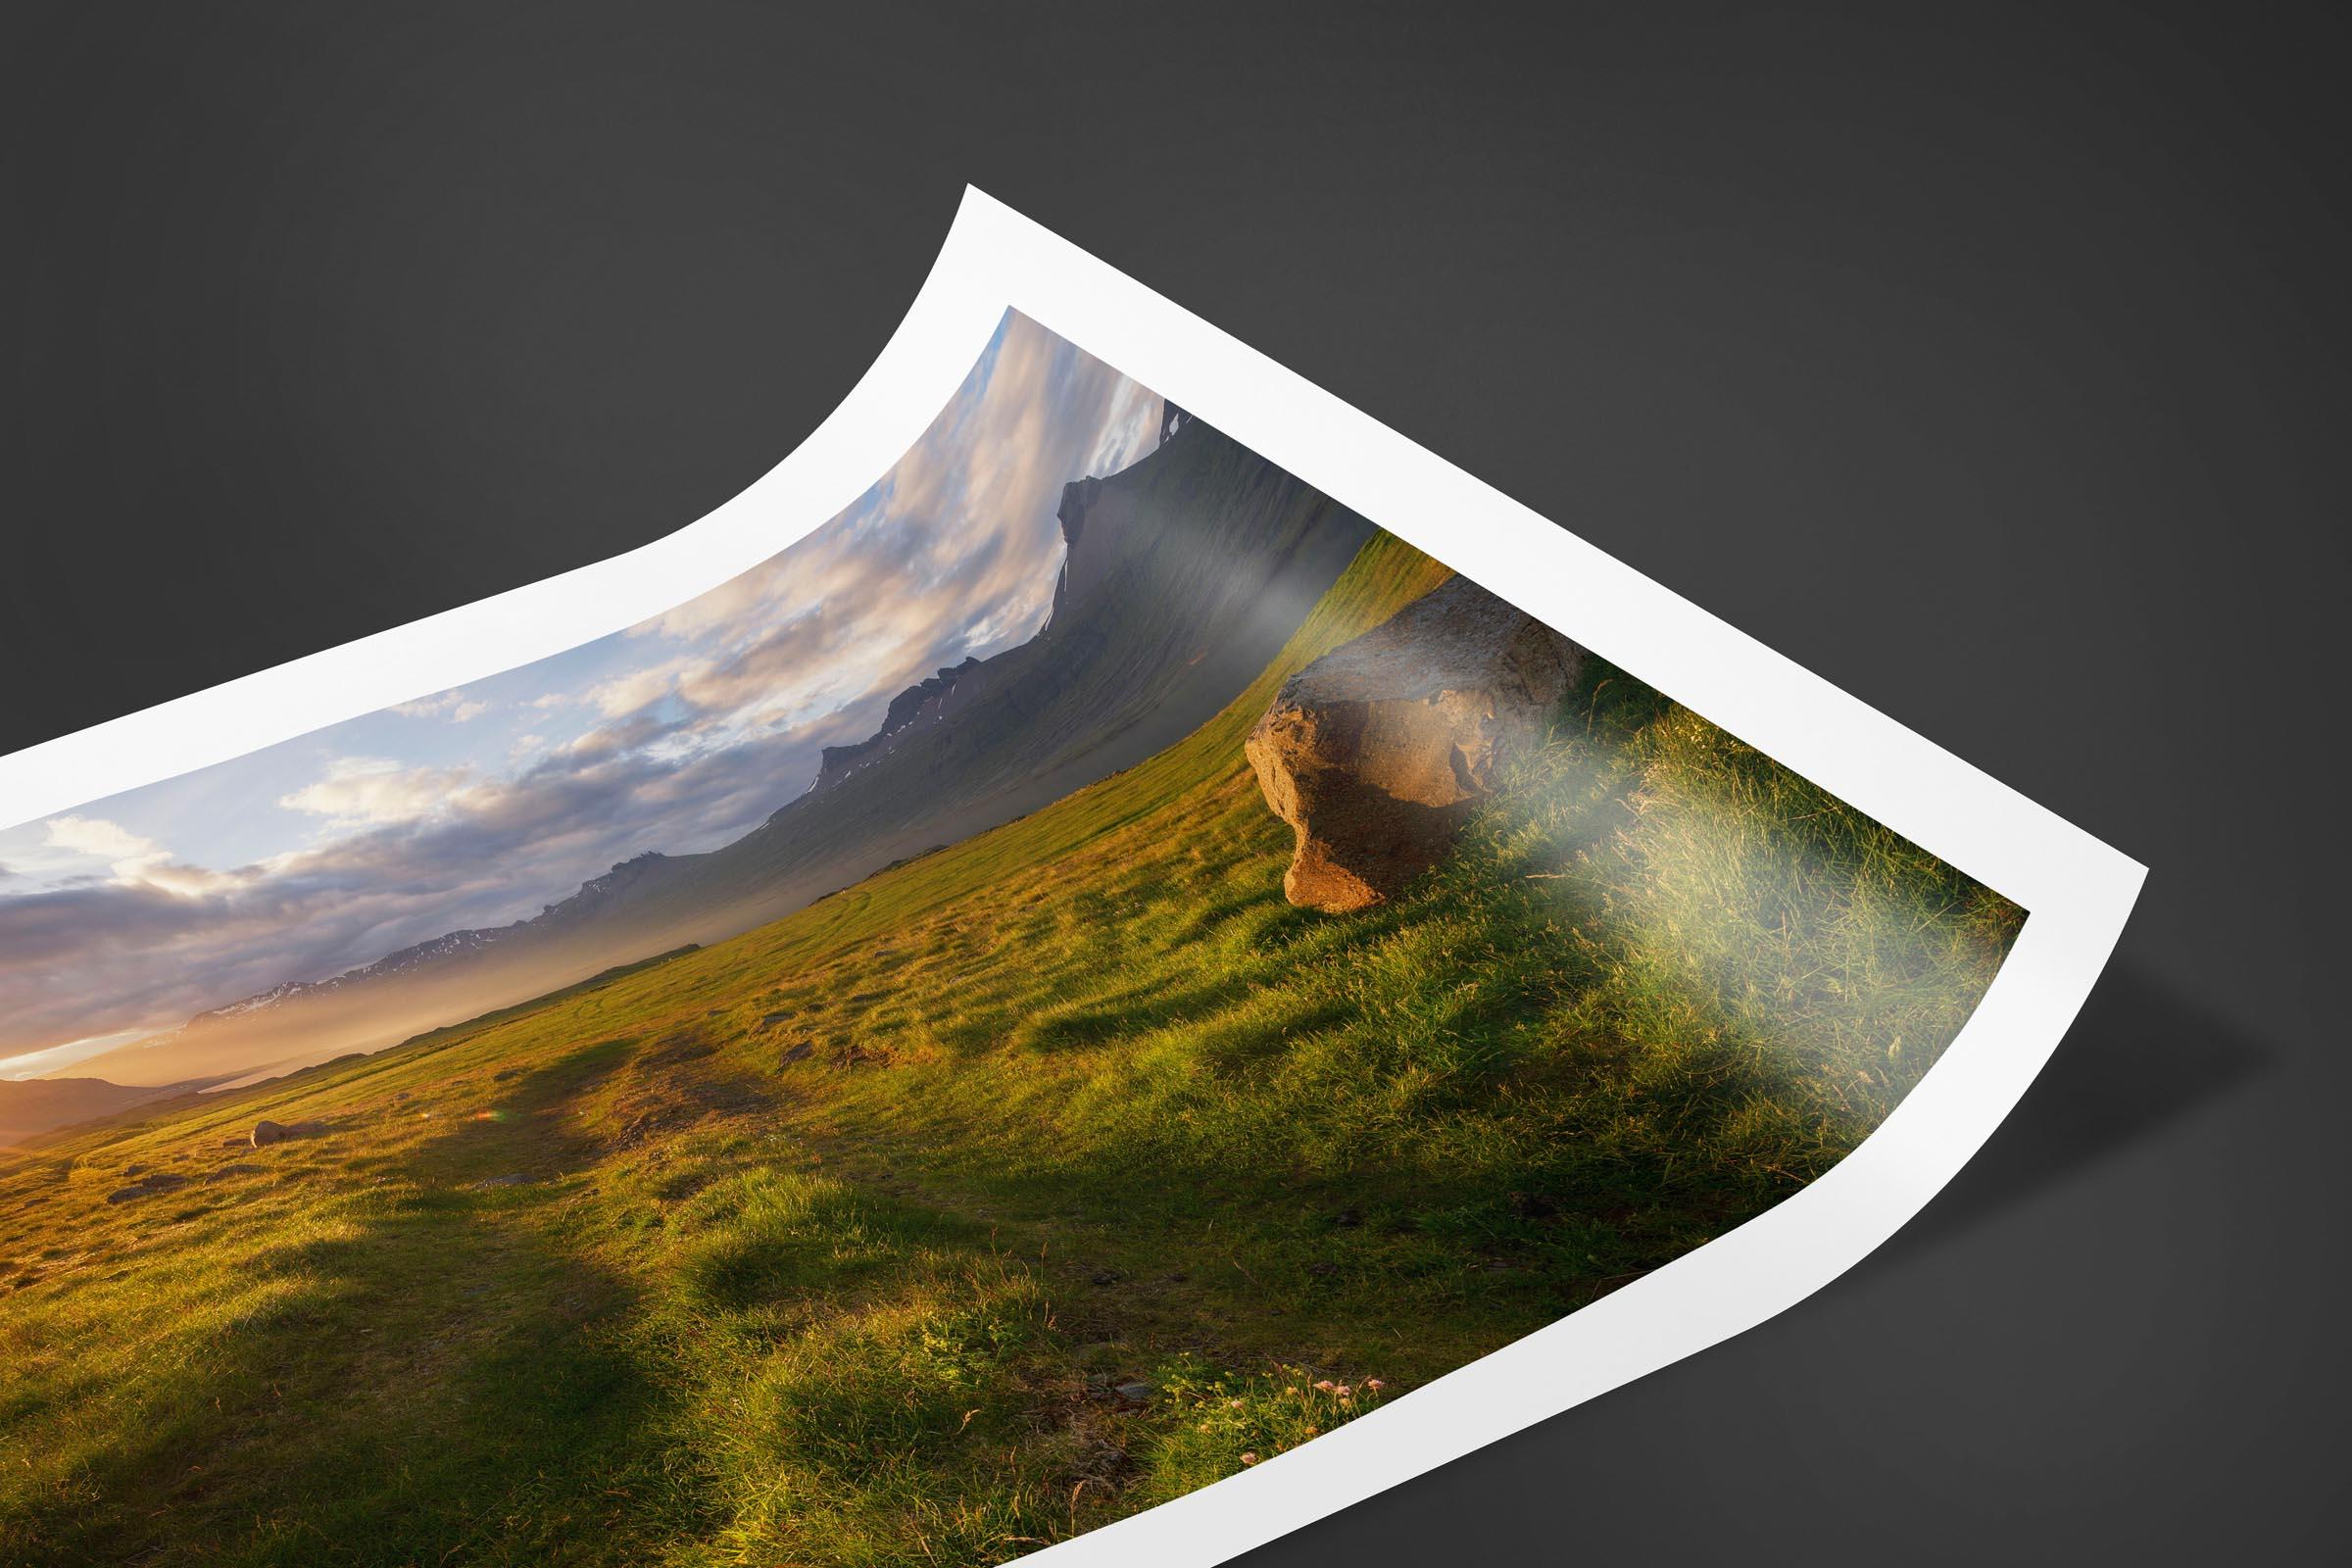 Fine art limited edition print of Sunburst Meadow in Djupivogur, Iceland by Brent Goldman Photography